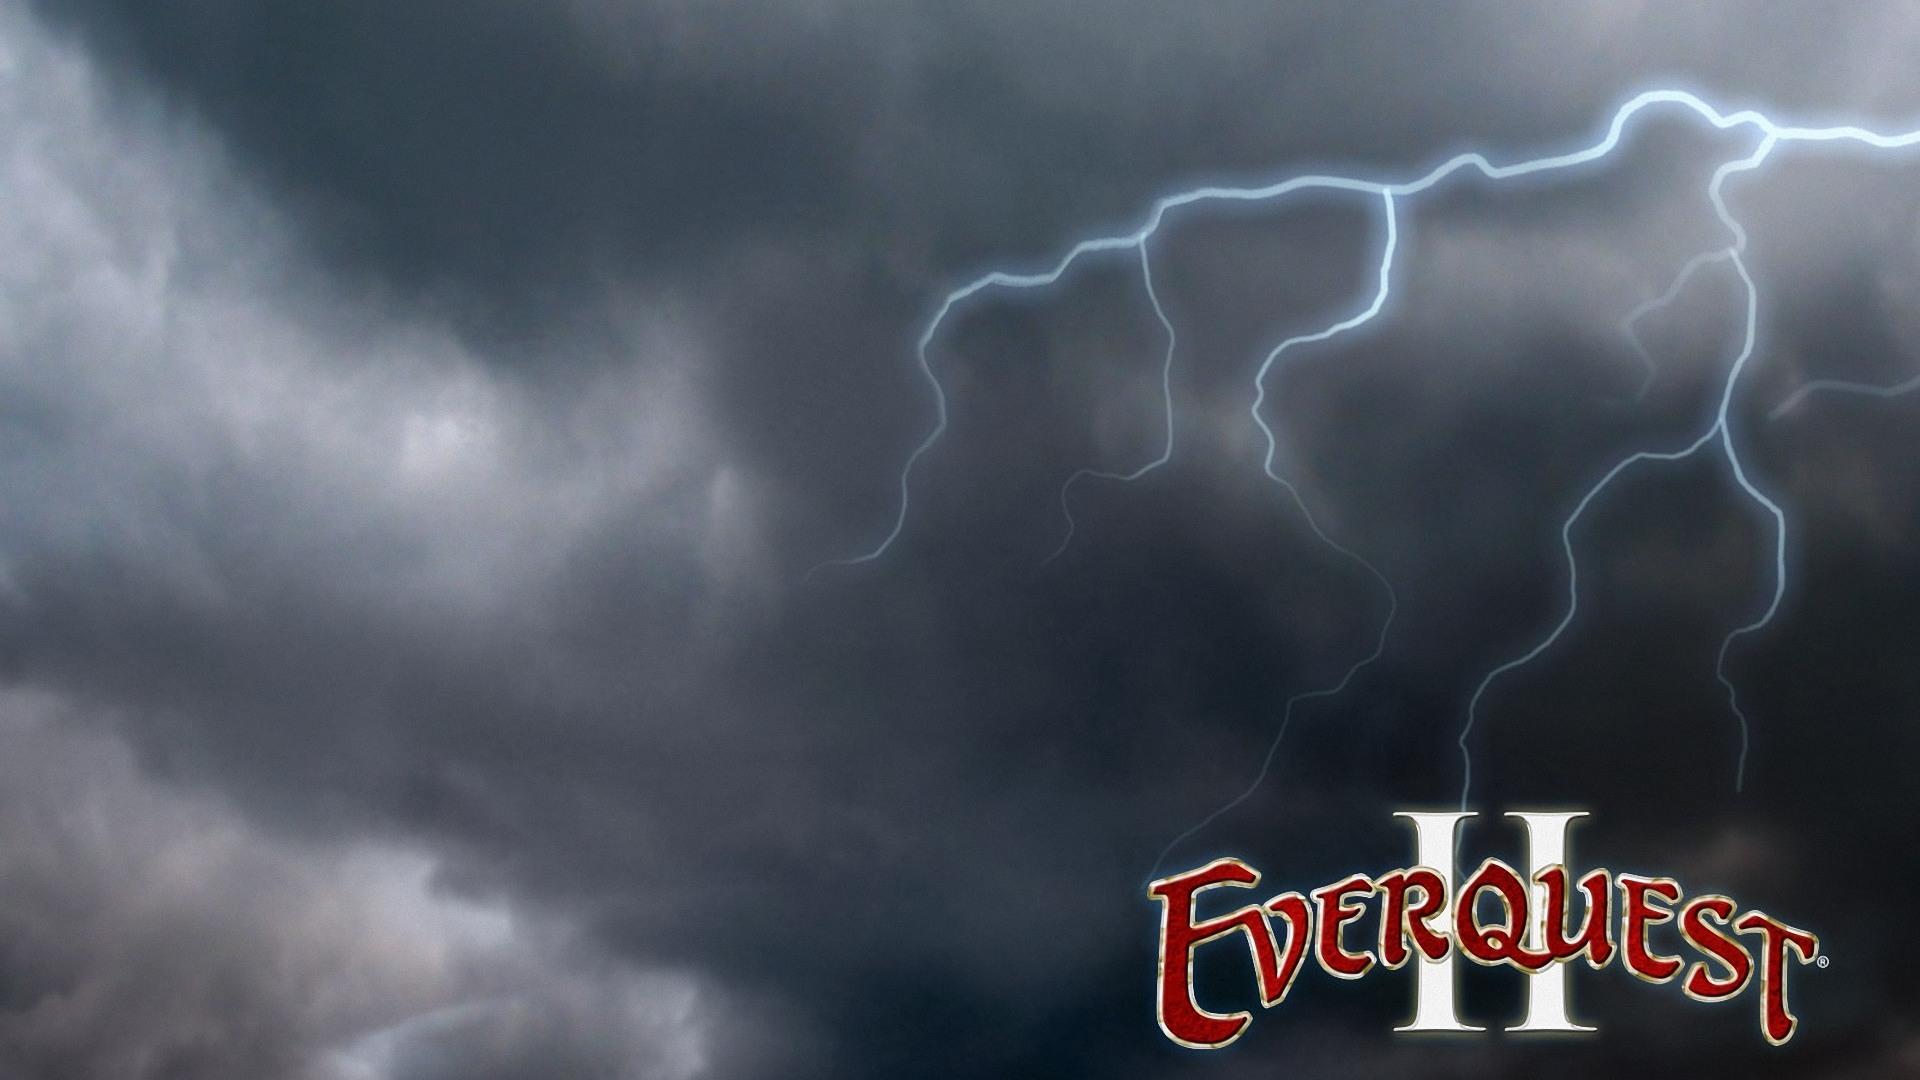 50] Everquest 2 Wallpaper on WallpaperSafari 1920x1080